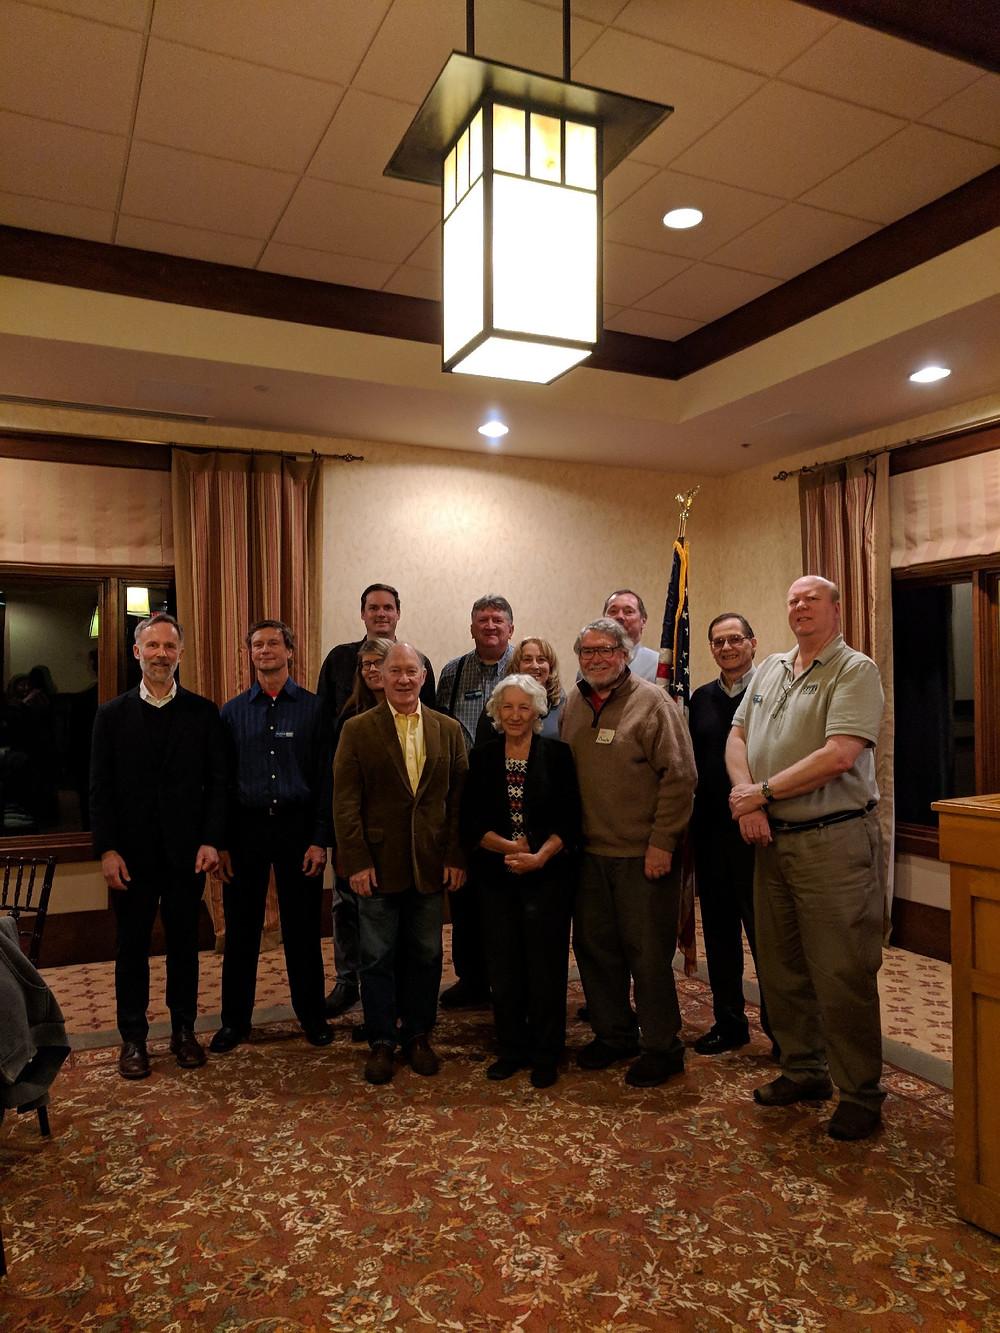 Andy Johnson and the MWA Board of Directors